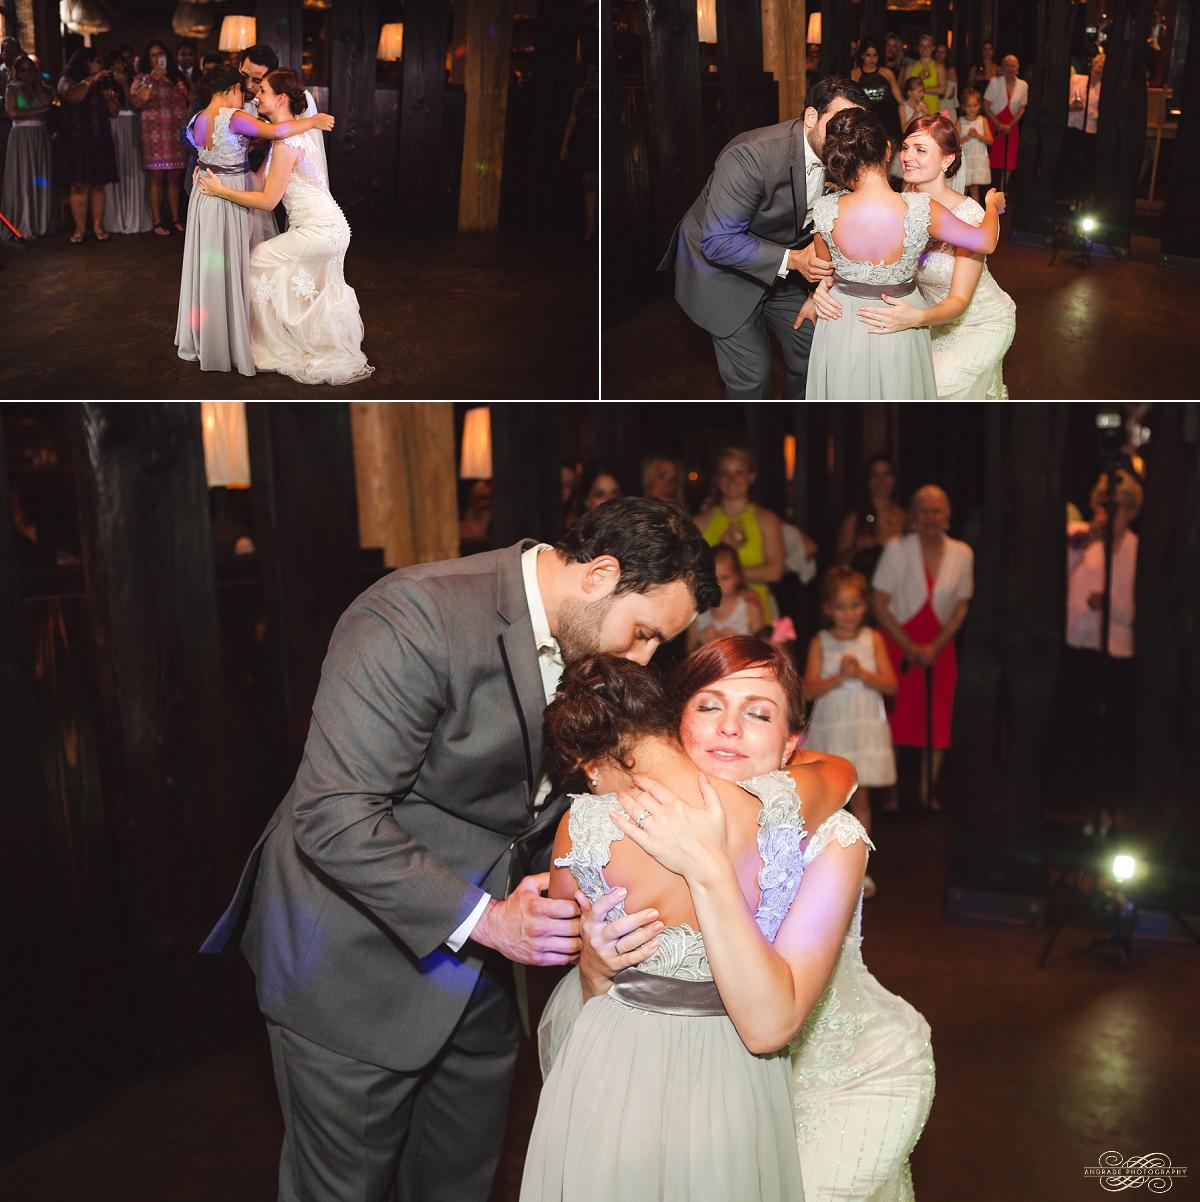 Jillian & Felix Chicago Wedding Photography at Oak & Char Trump Tower and Chicago Athletic Association_0053.jpg